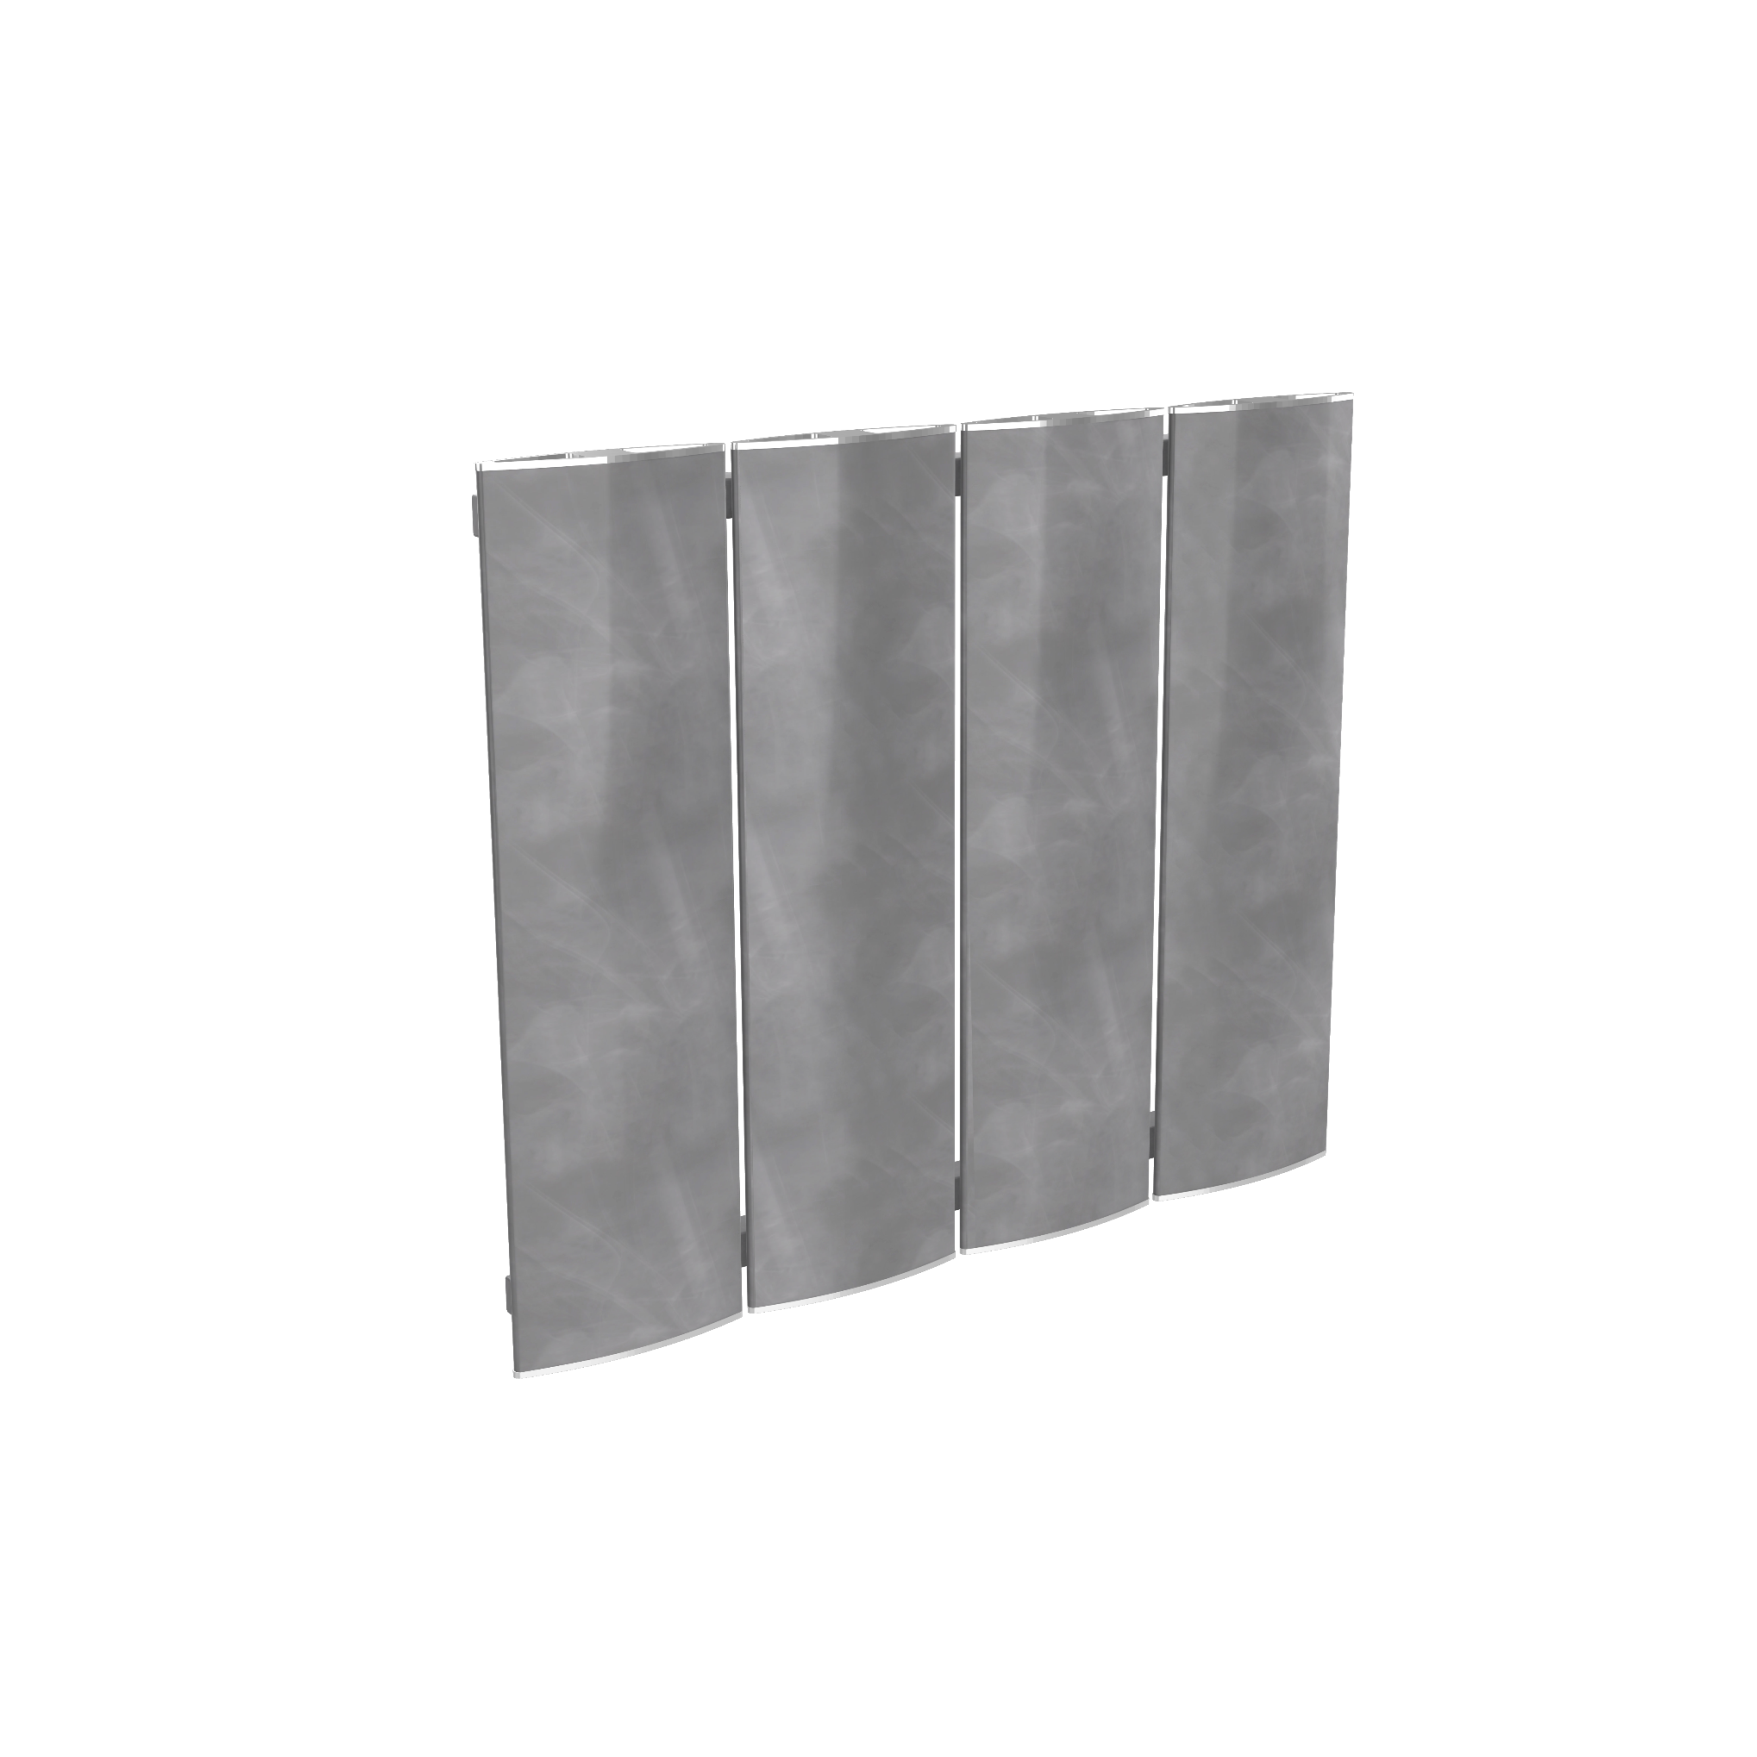 radiator modular Ridea Othello Plate Slim gri